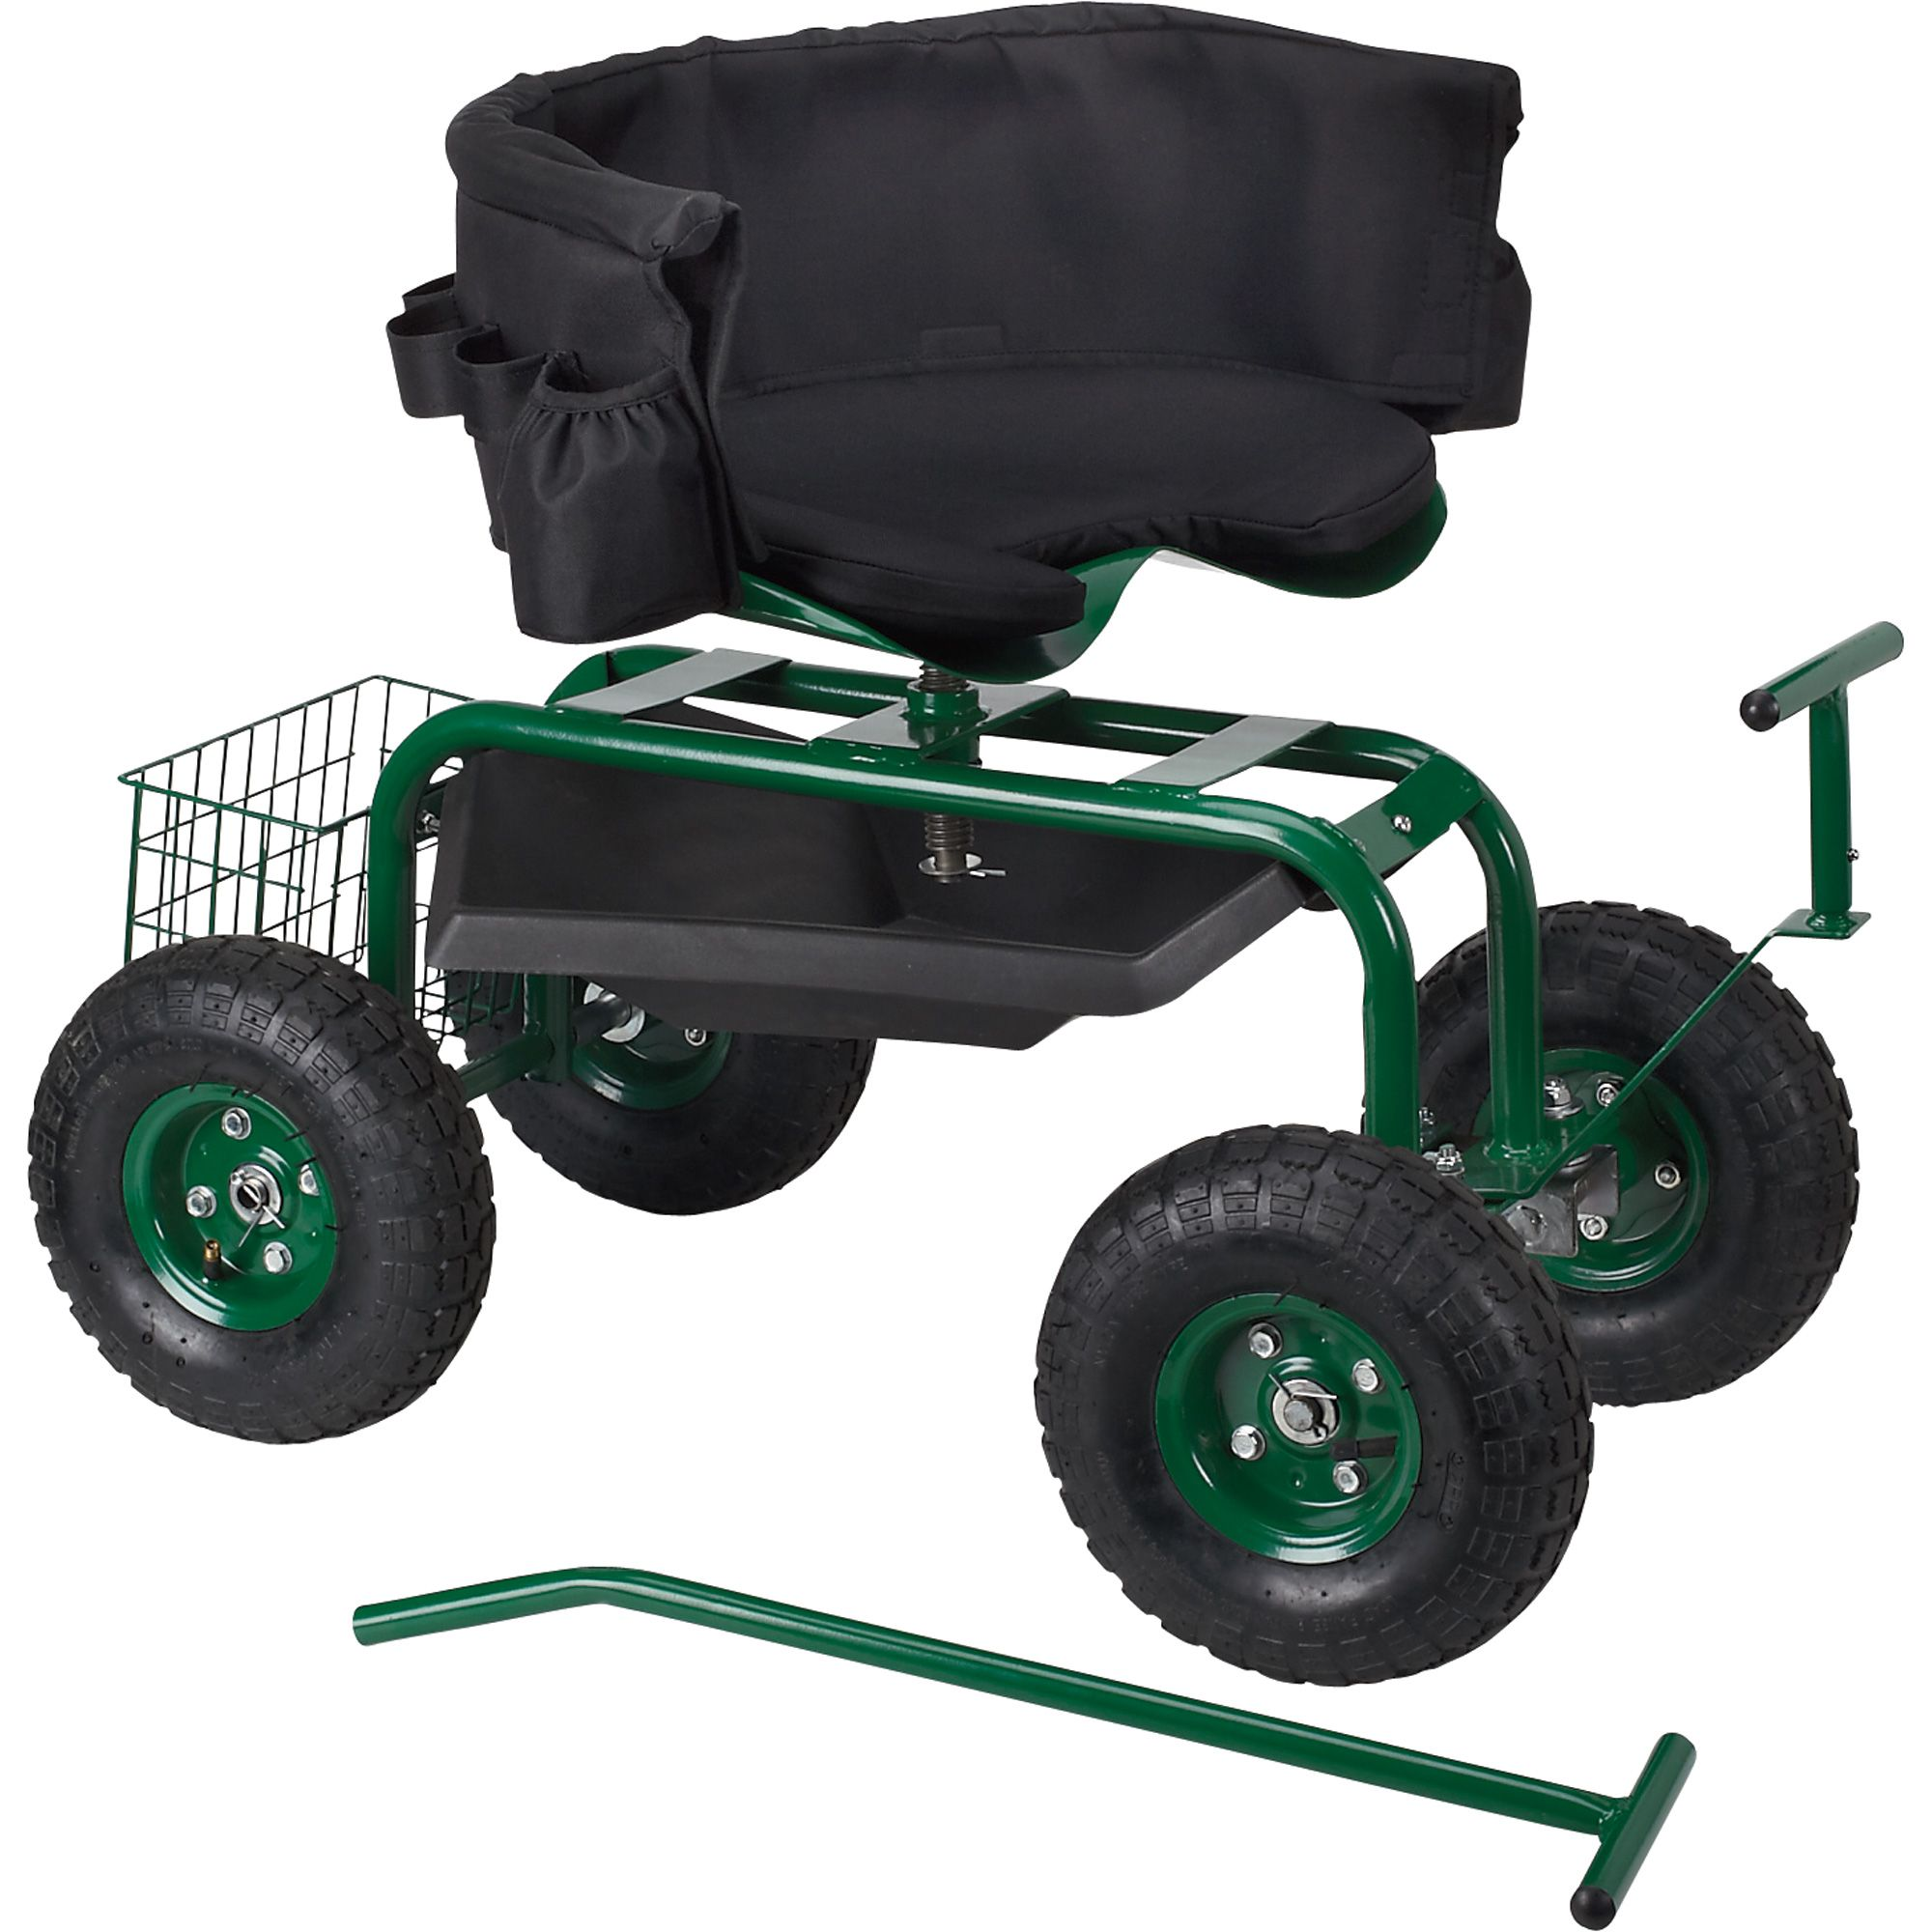 Deluxe Rolling Garden Seat With Easy Change Turnbars